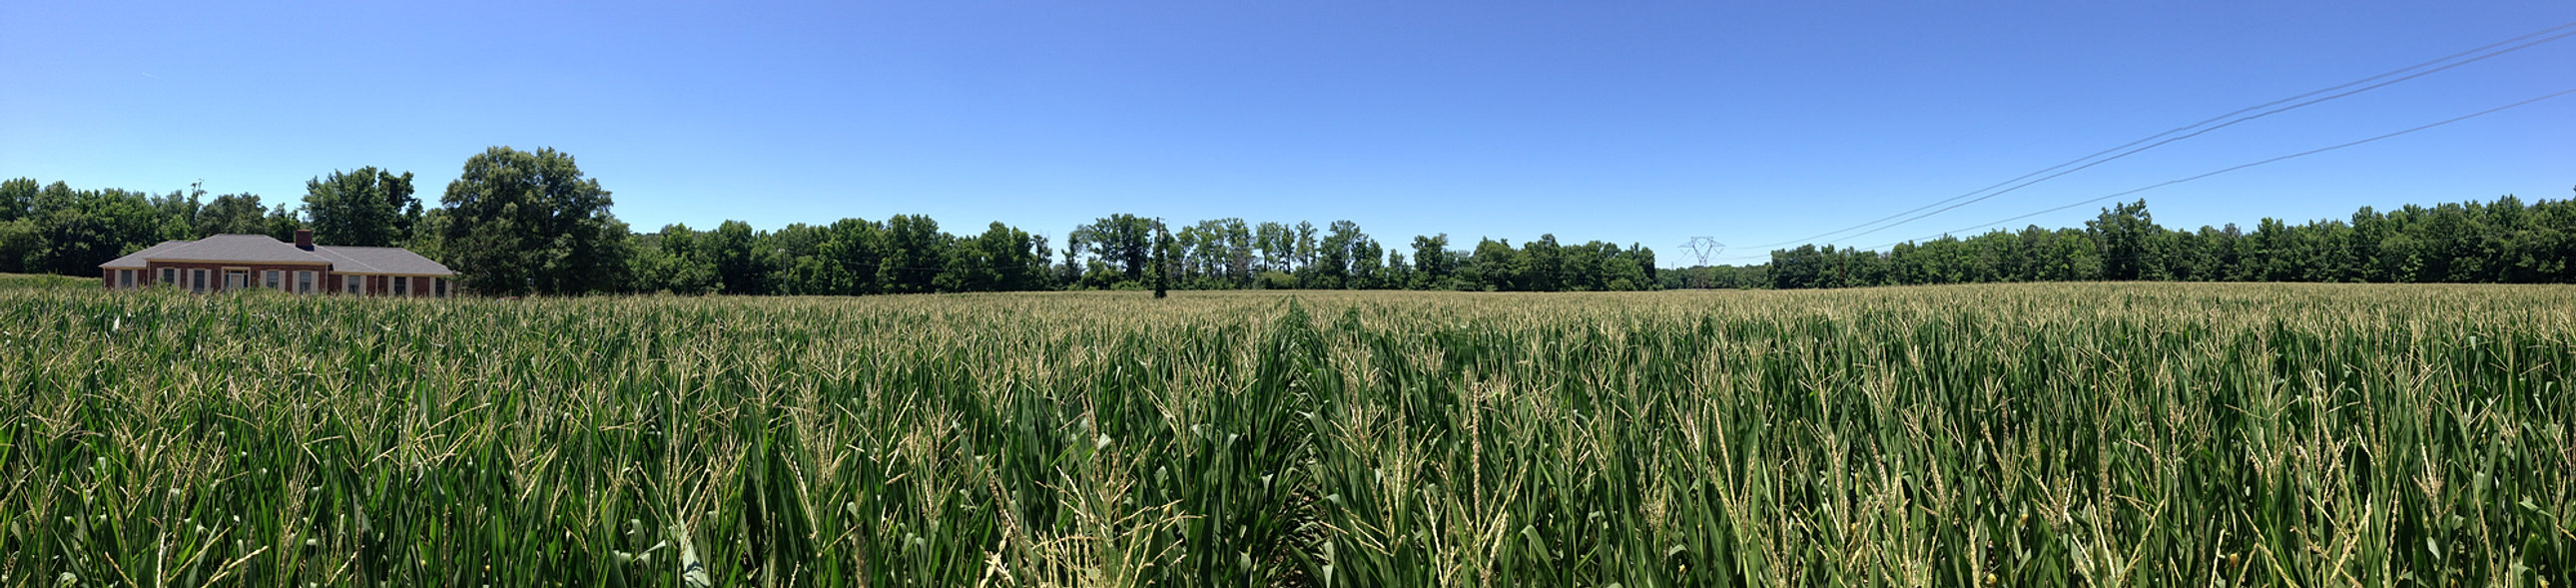 Cornfields on the farm